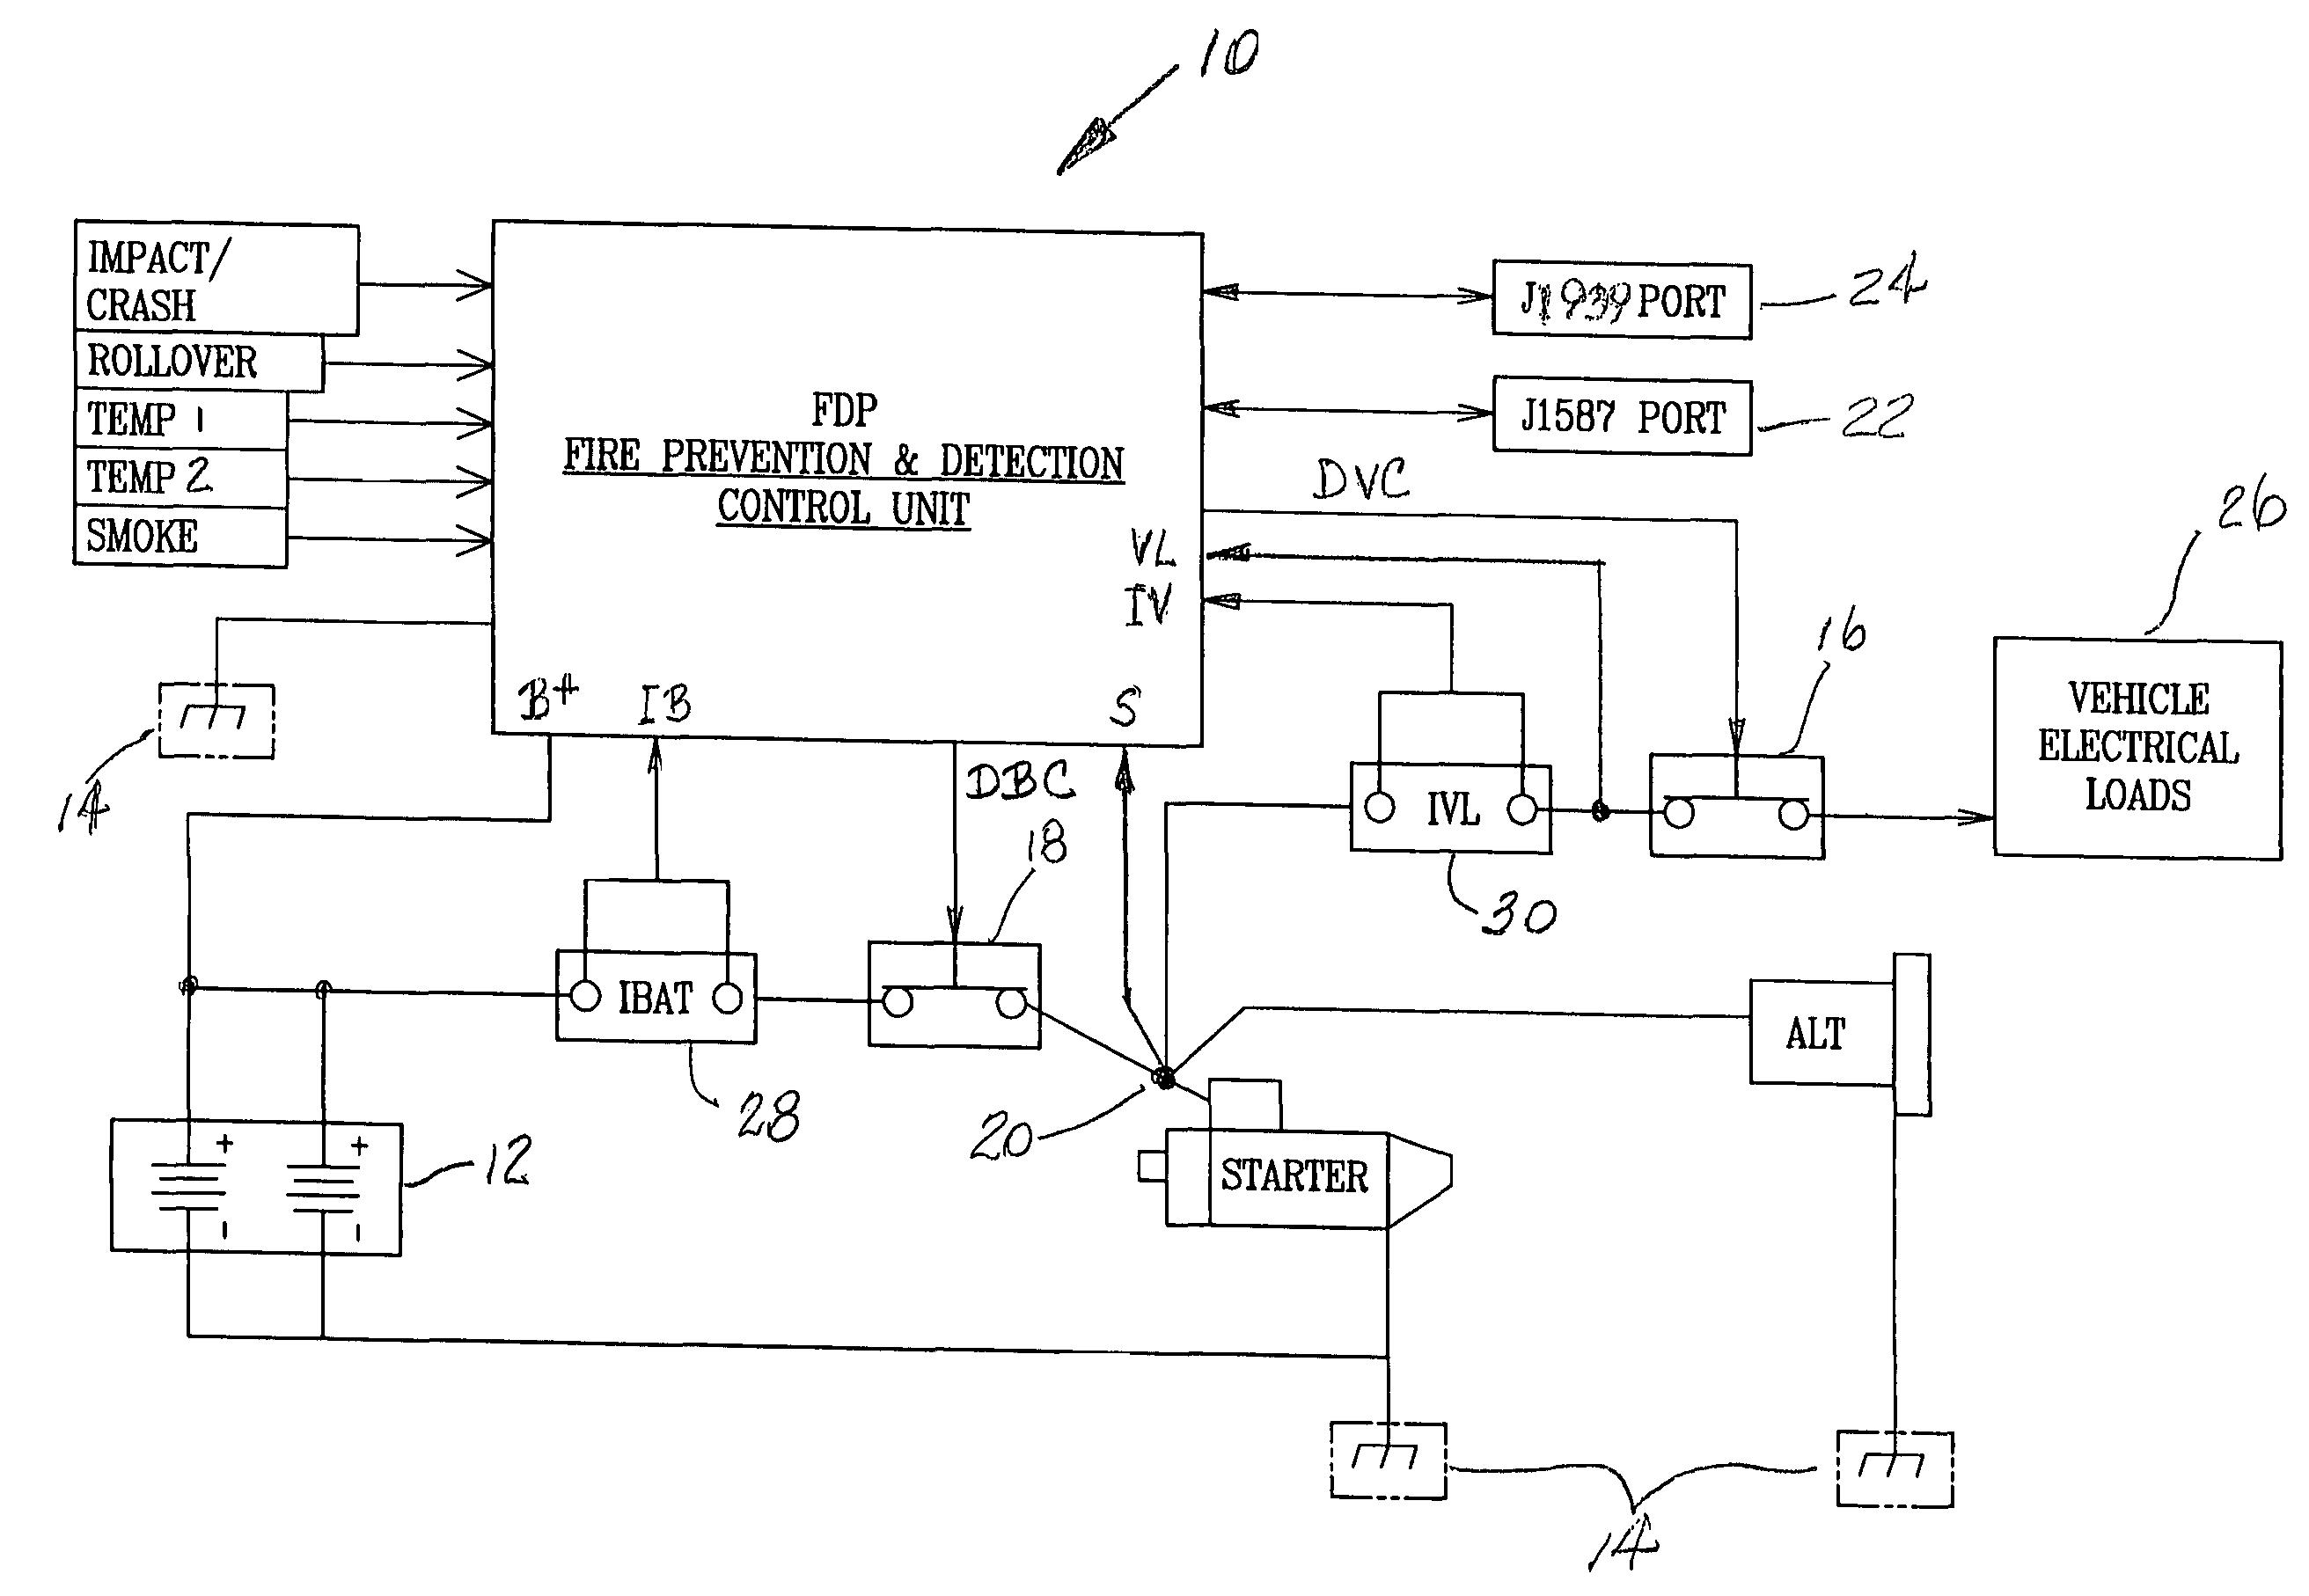 wiring diagram yamaha umax g23 wiring diagram for you • wiring diagram yamaha umax g23 wiring library rh 22 budoshop4you de